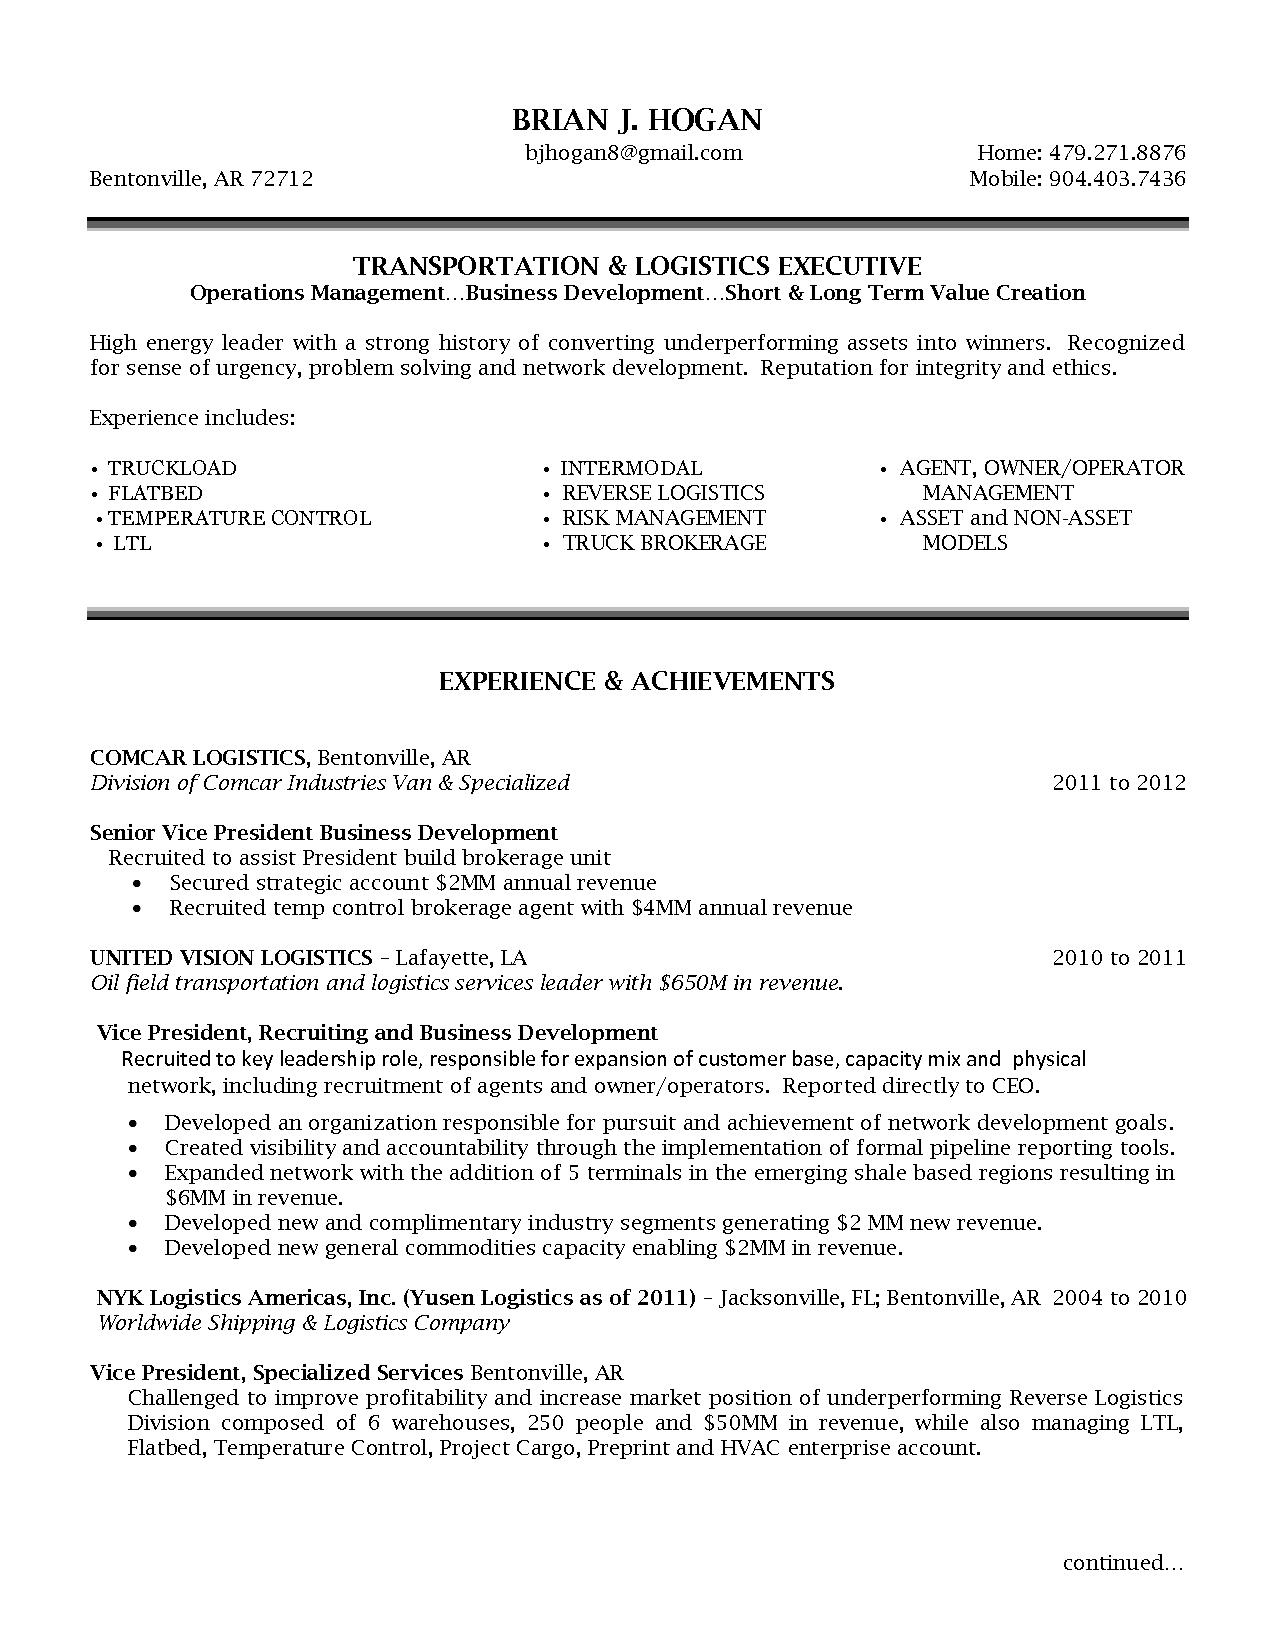 senior logistic management resume  VP Director Operations Logistics in Bentonville AR Resume